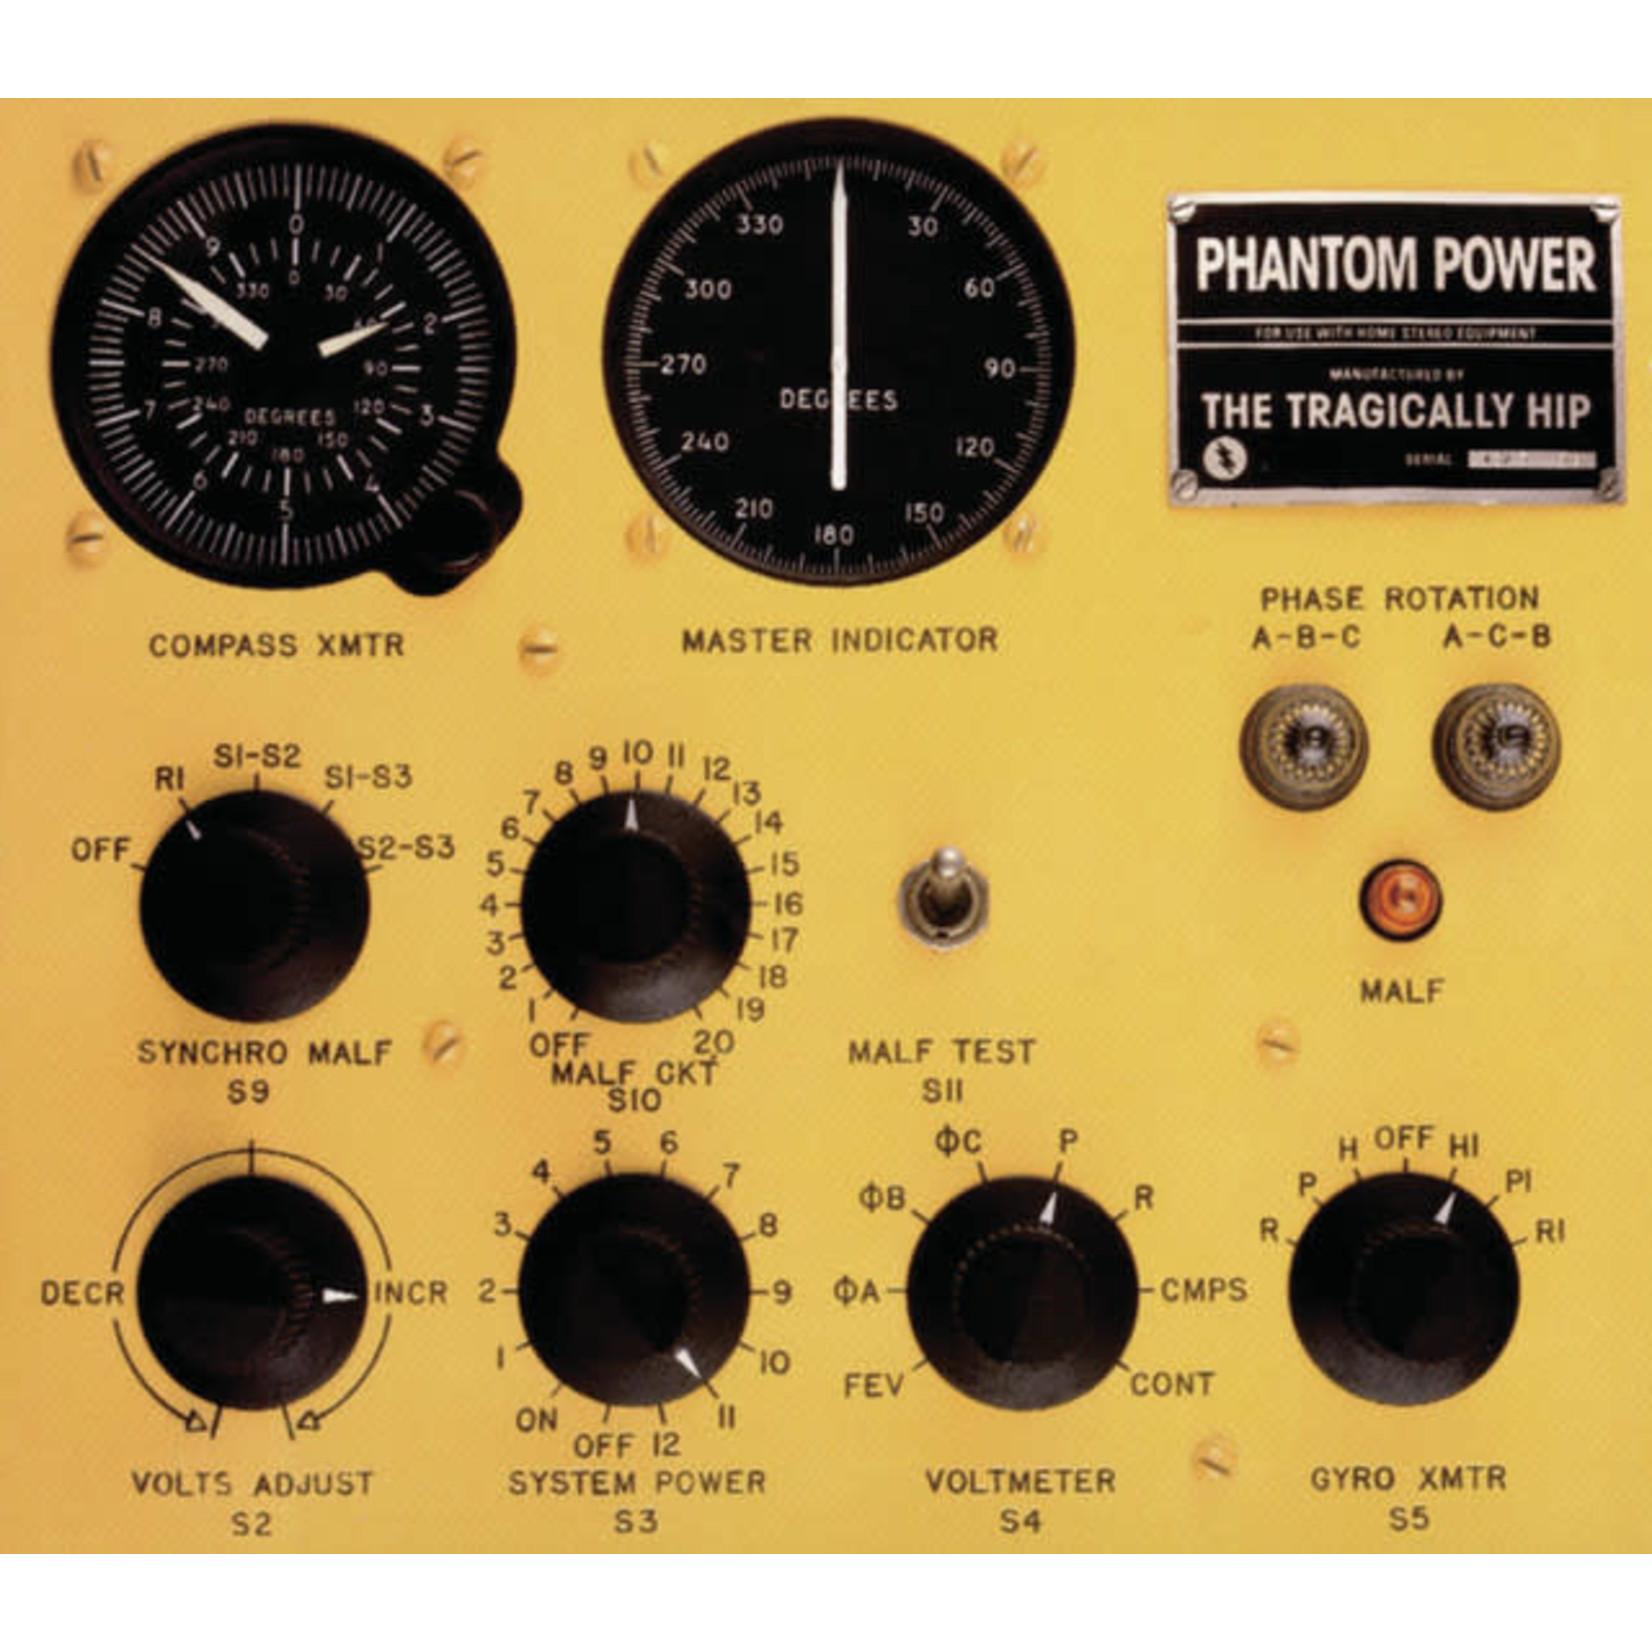 Vinyl The Tragically Hip - Phantom Power